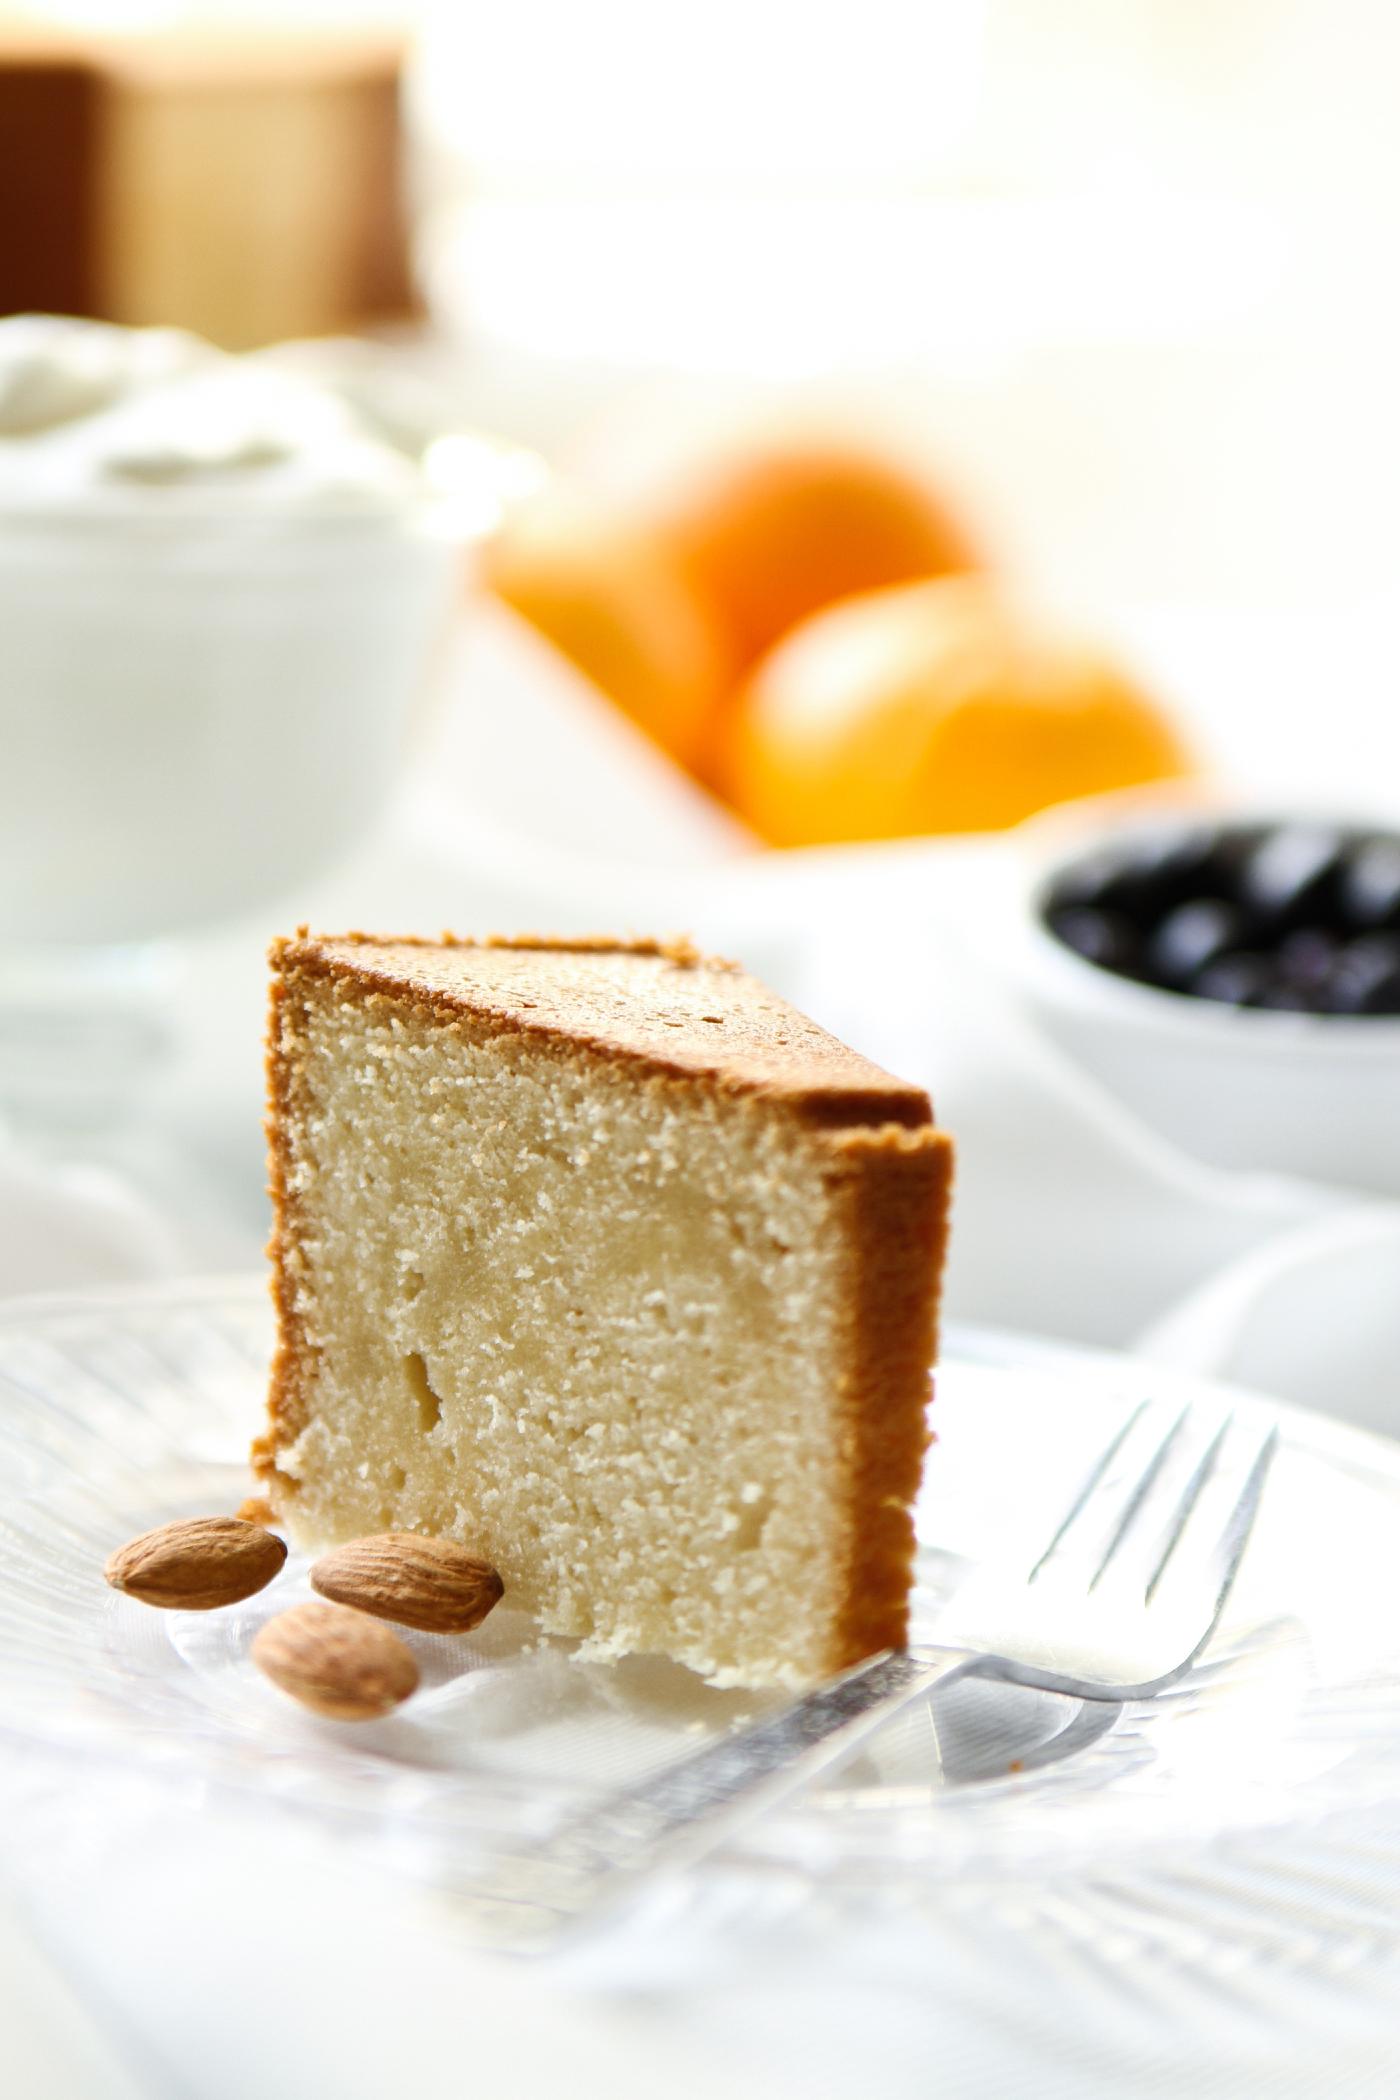 oj&chanda-creamchspoundcake - 44